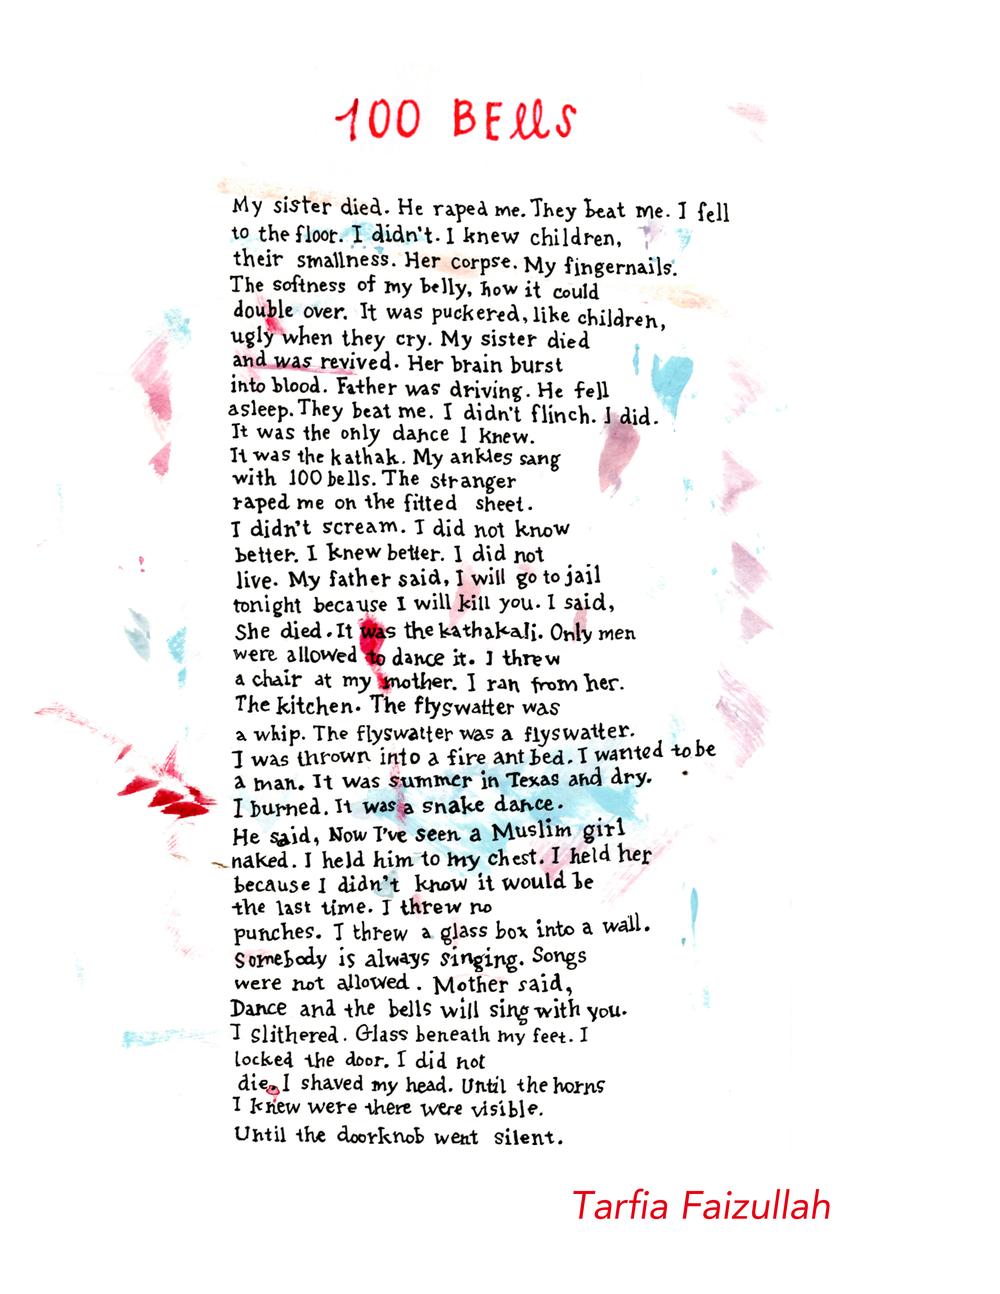 Tarfia Faizullah / Poem